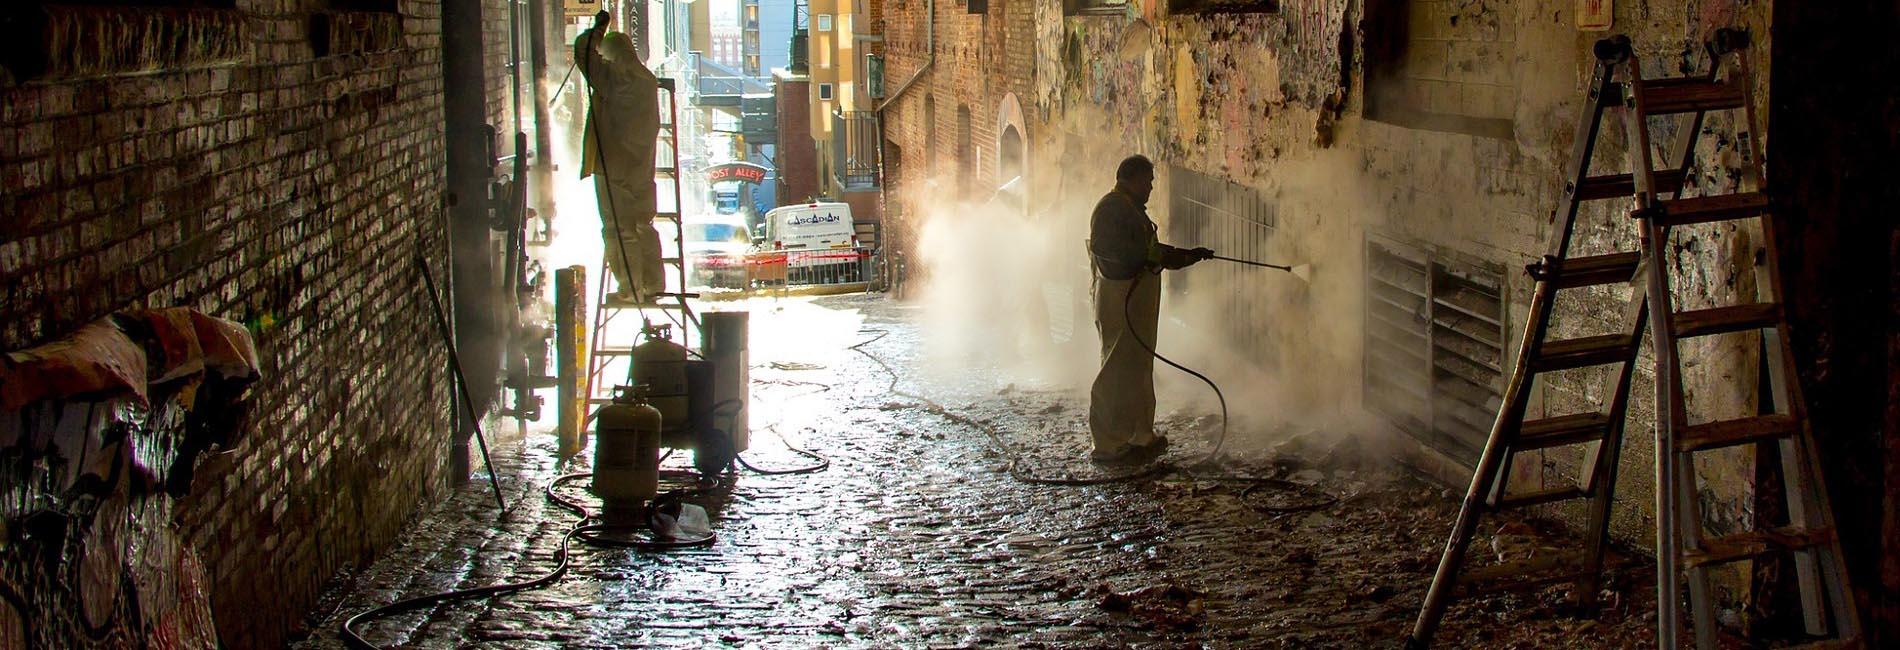 rimozione graffiti - pulizia muri - imbiancatura - impresa di pulizie saronno